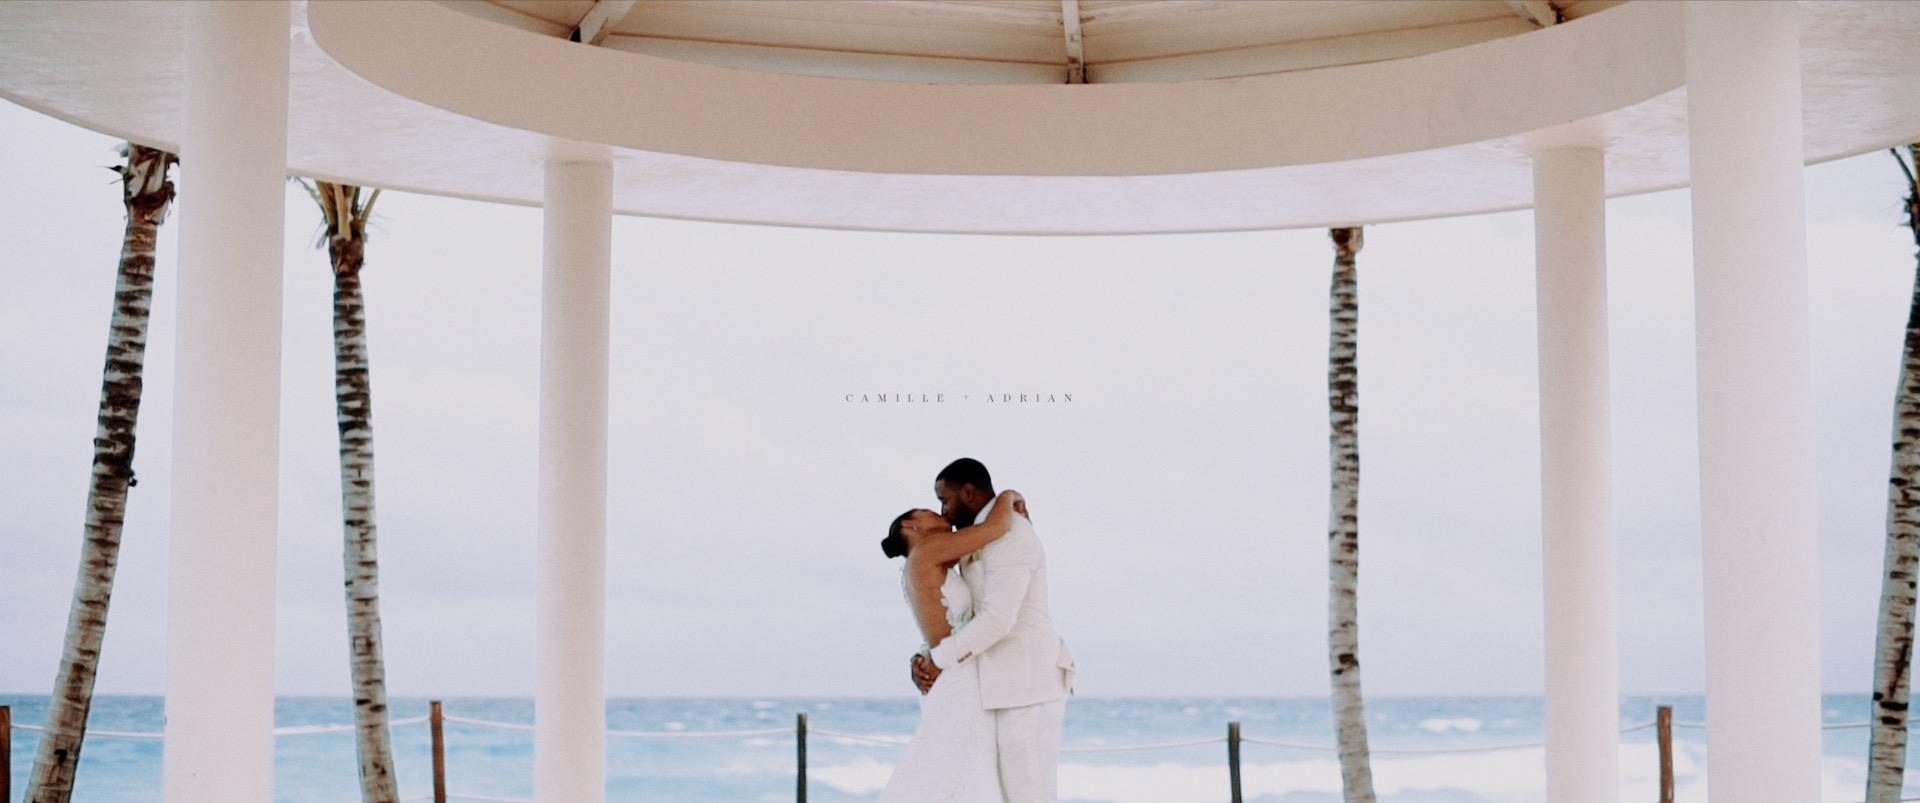 27078Camille + Adrian | Cancun, Mexico